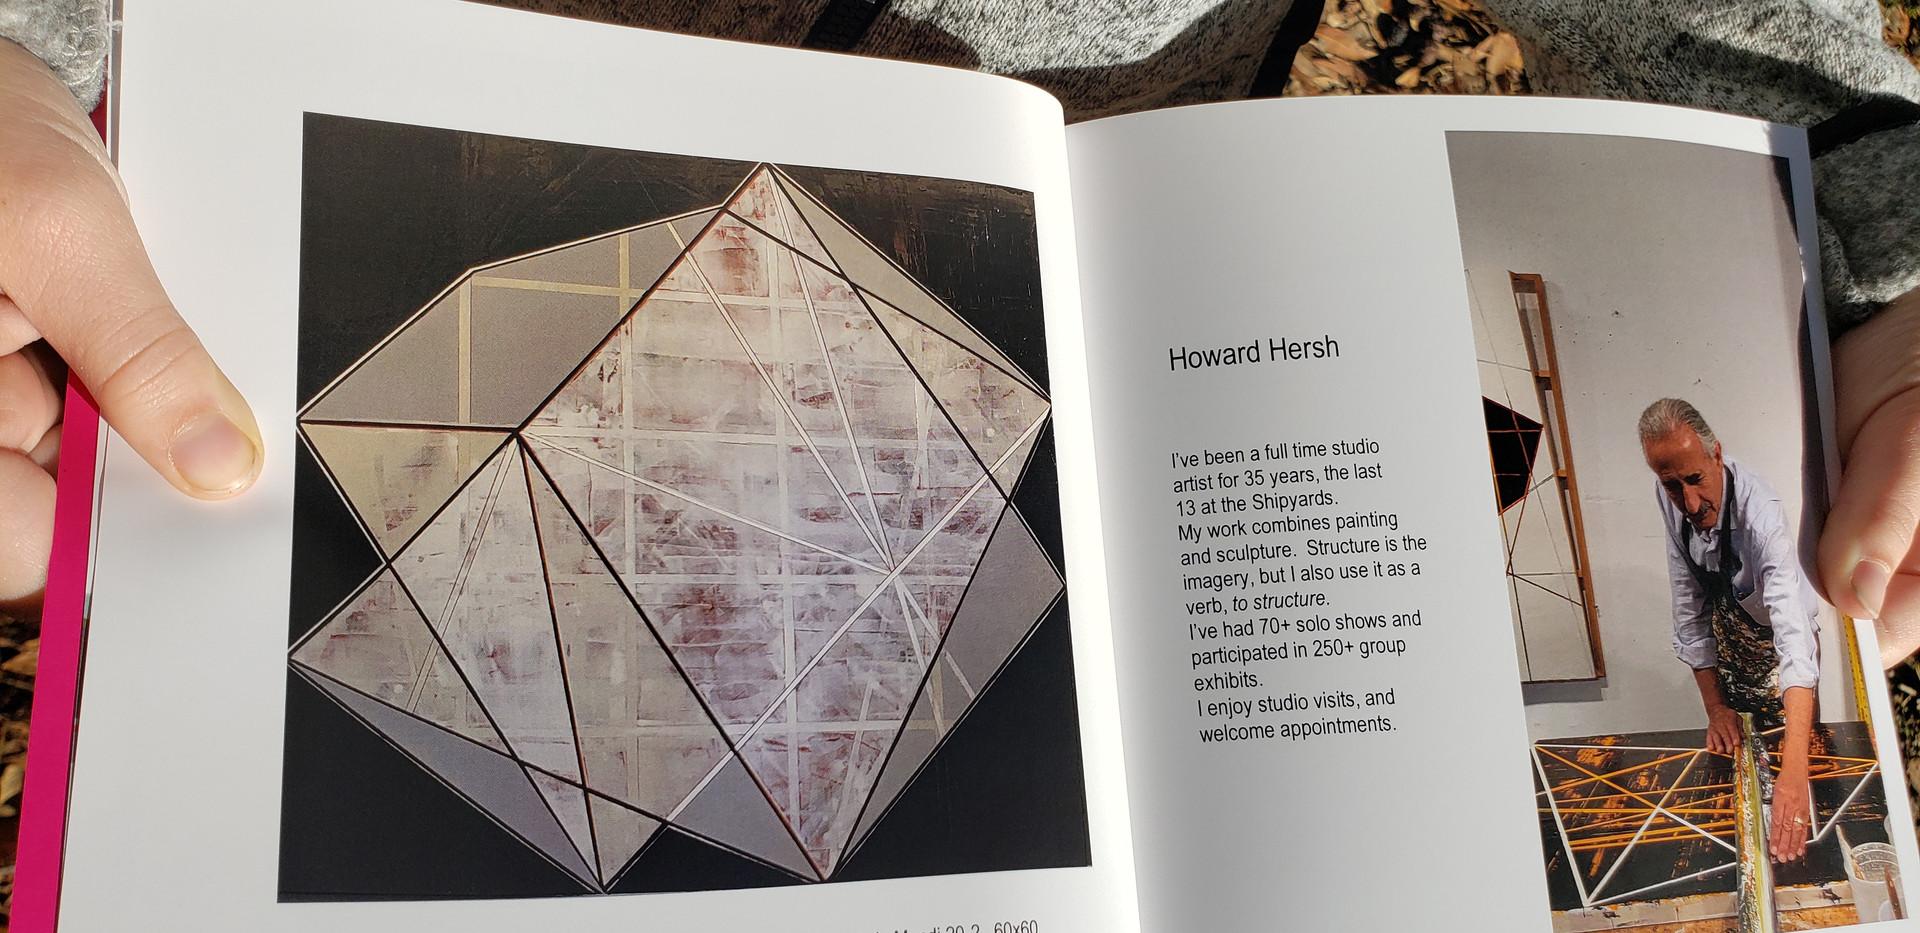 Howard Hersh